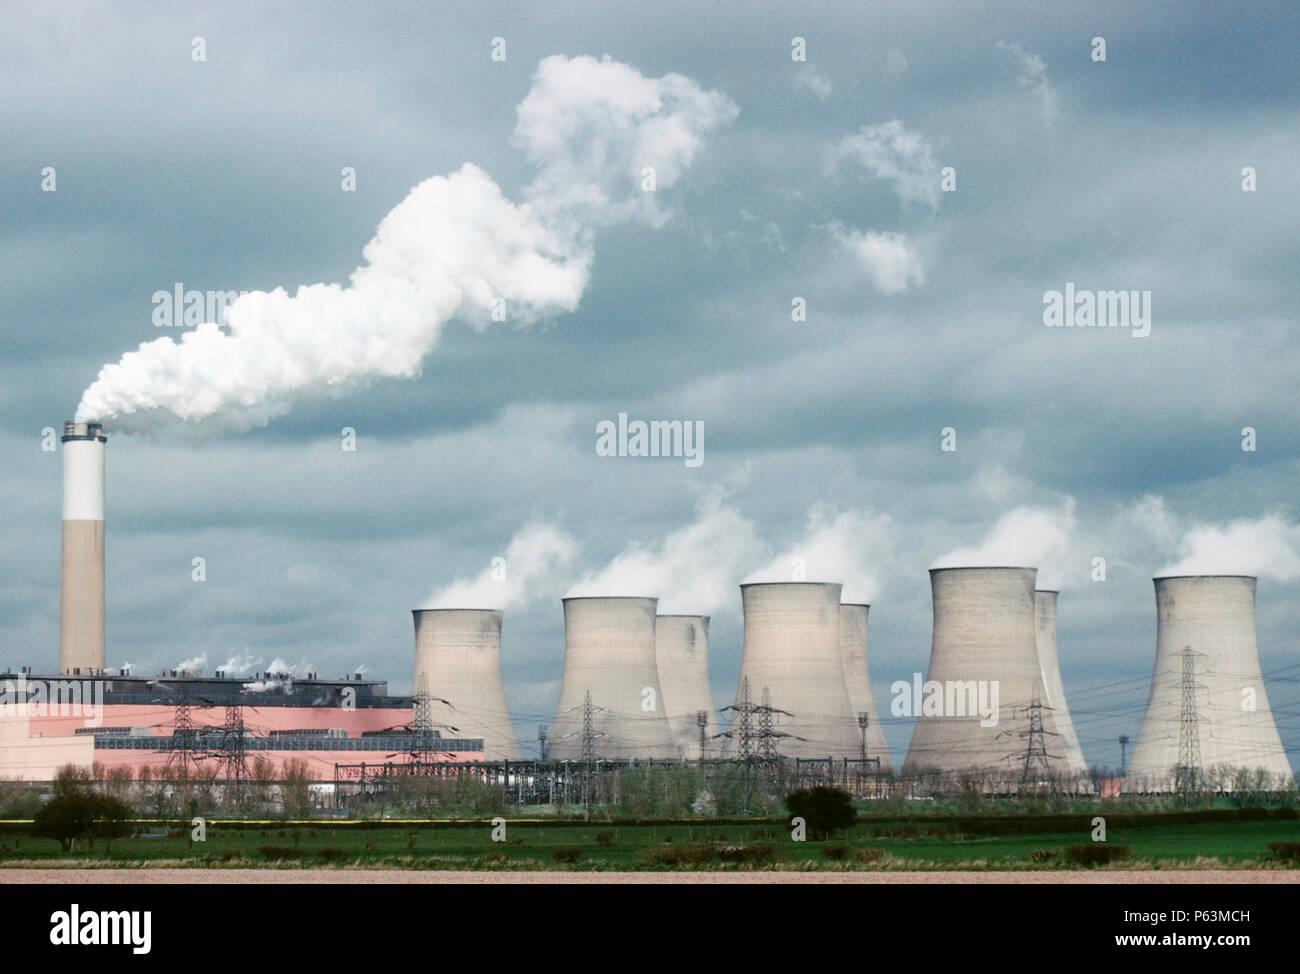 Coal fired power station on the Trent river at Cottam,  Nottinghamshire, UK - Stock Image